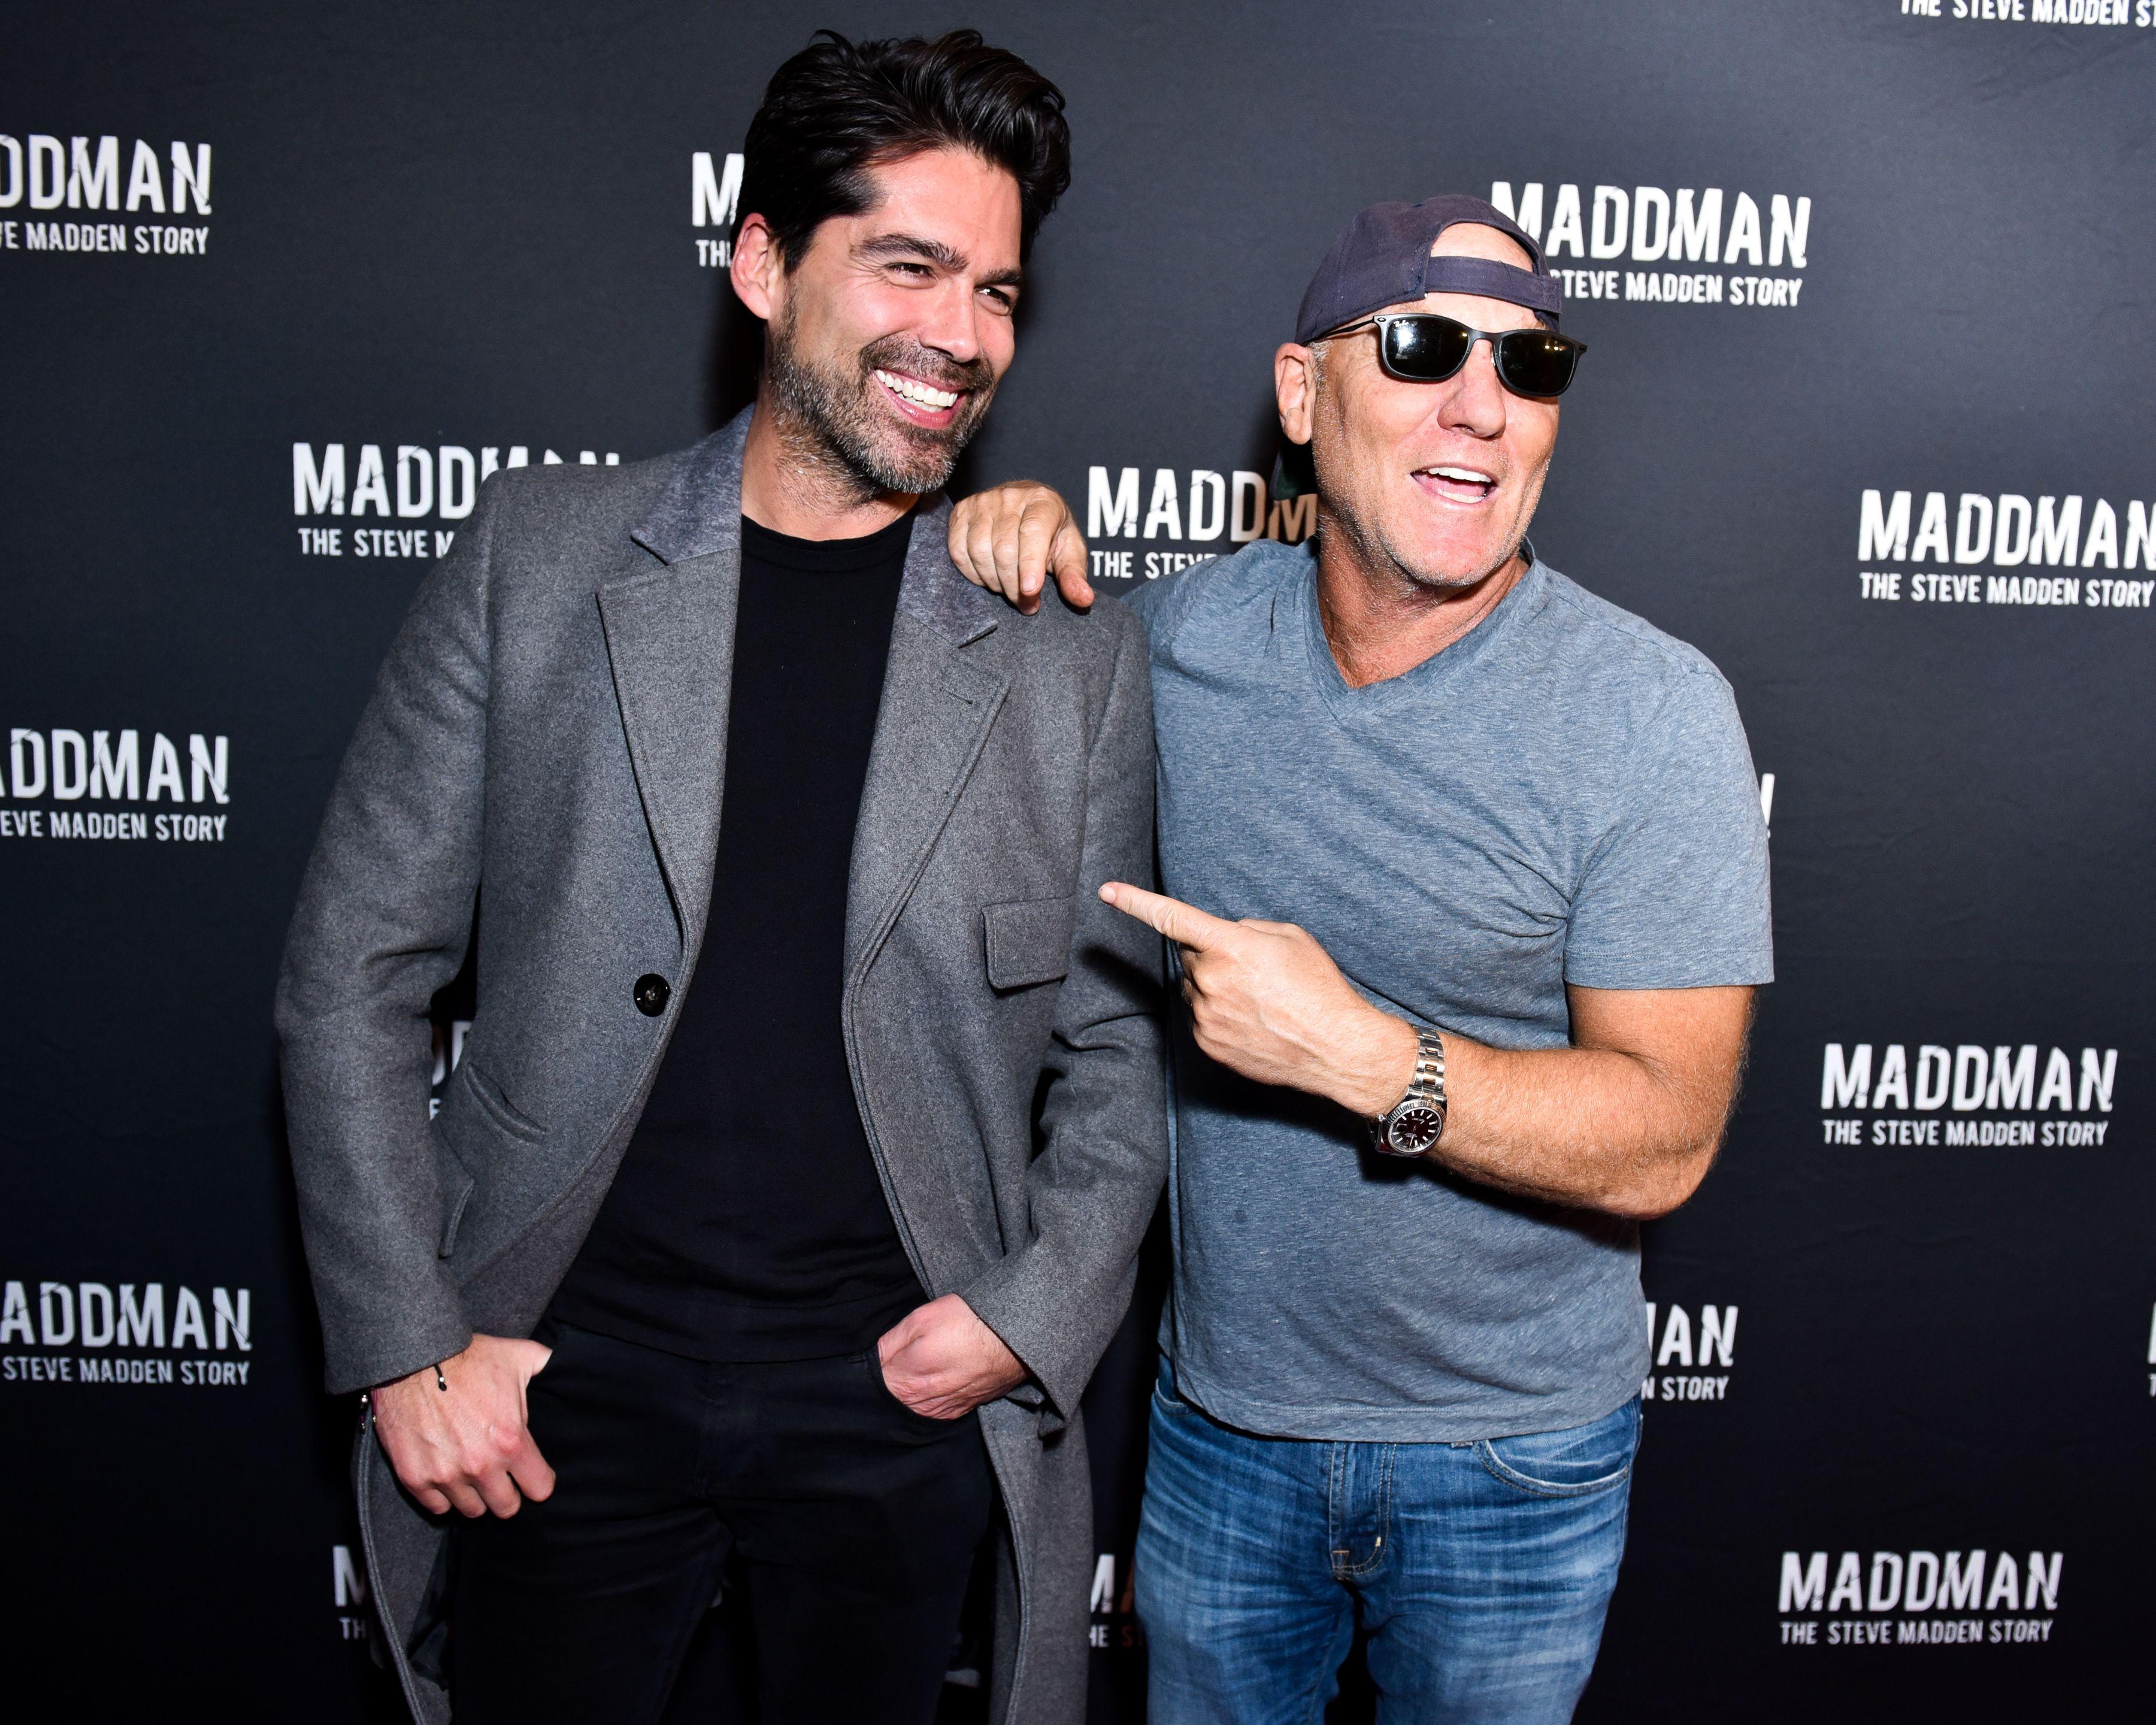 Brian Atwood, Steve Madden'Maddman: The Steve Madden Story' film premiere, New York, USA - 30 Nov 2017